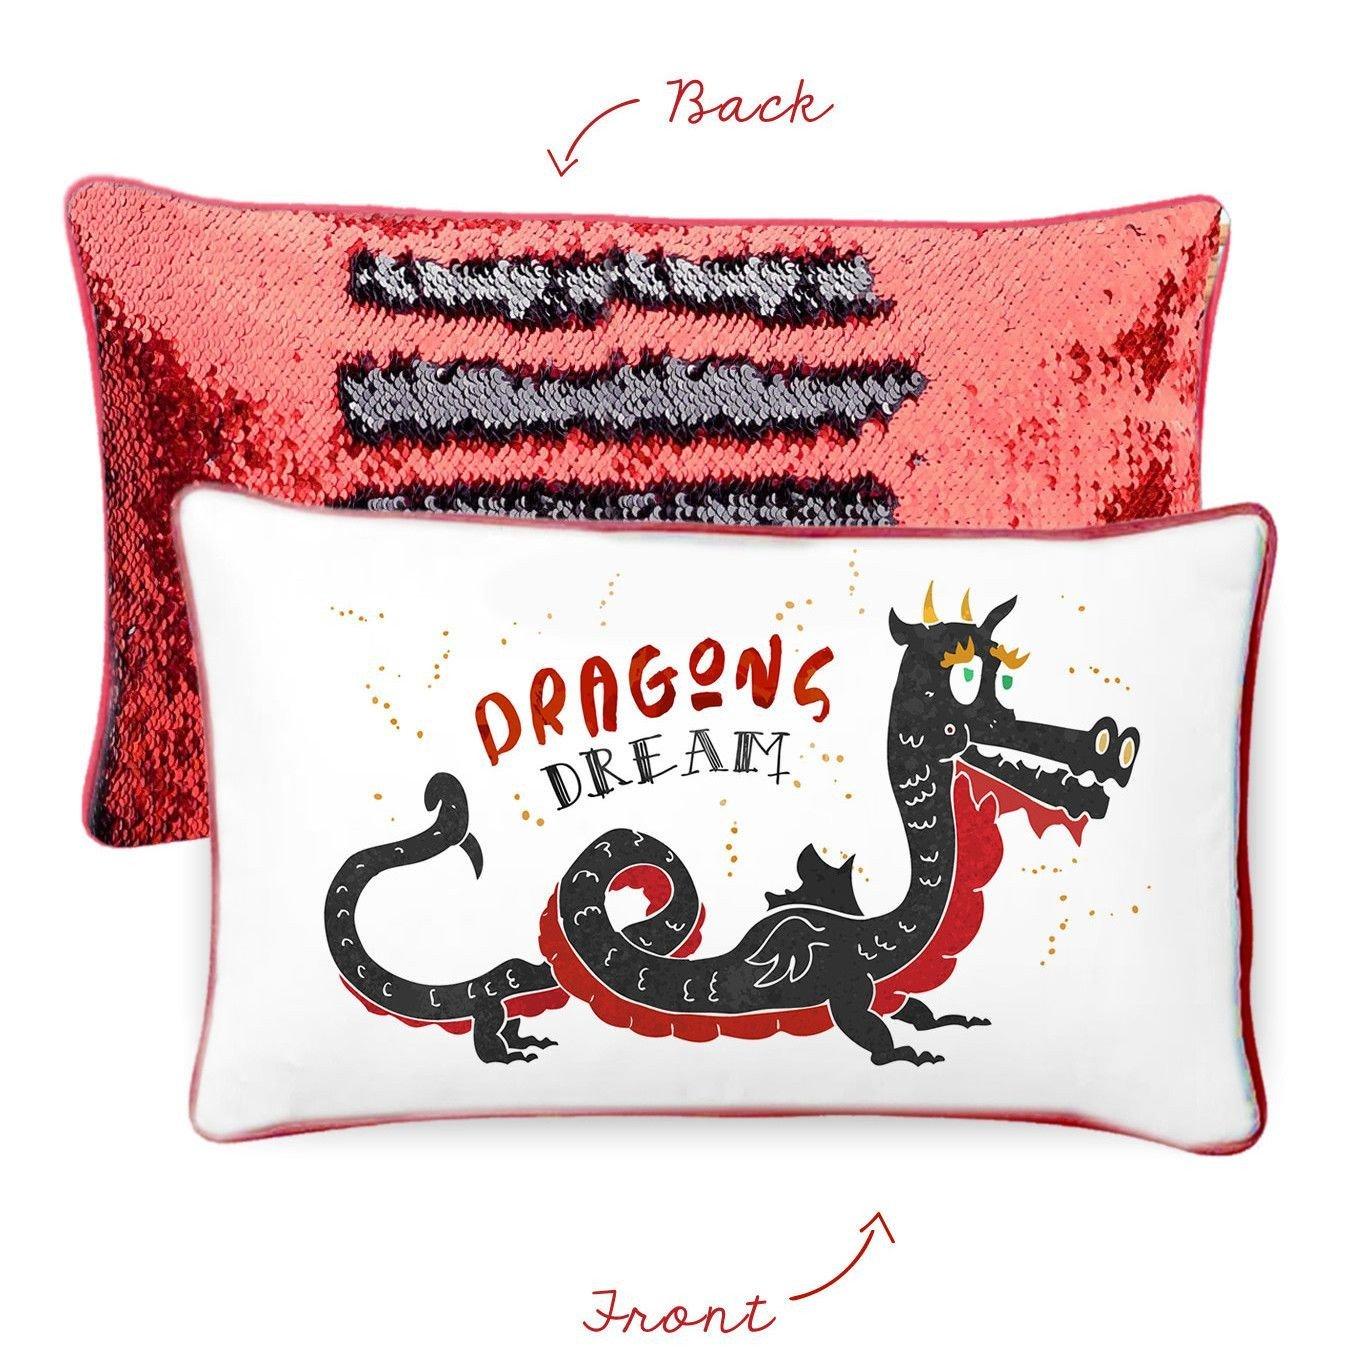 Mermaid Pillow - DRAGONS DREAM